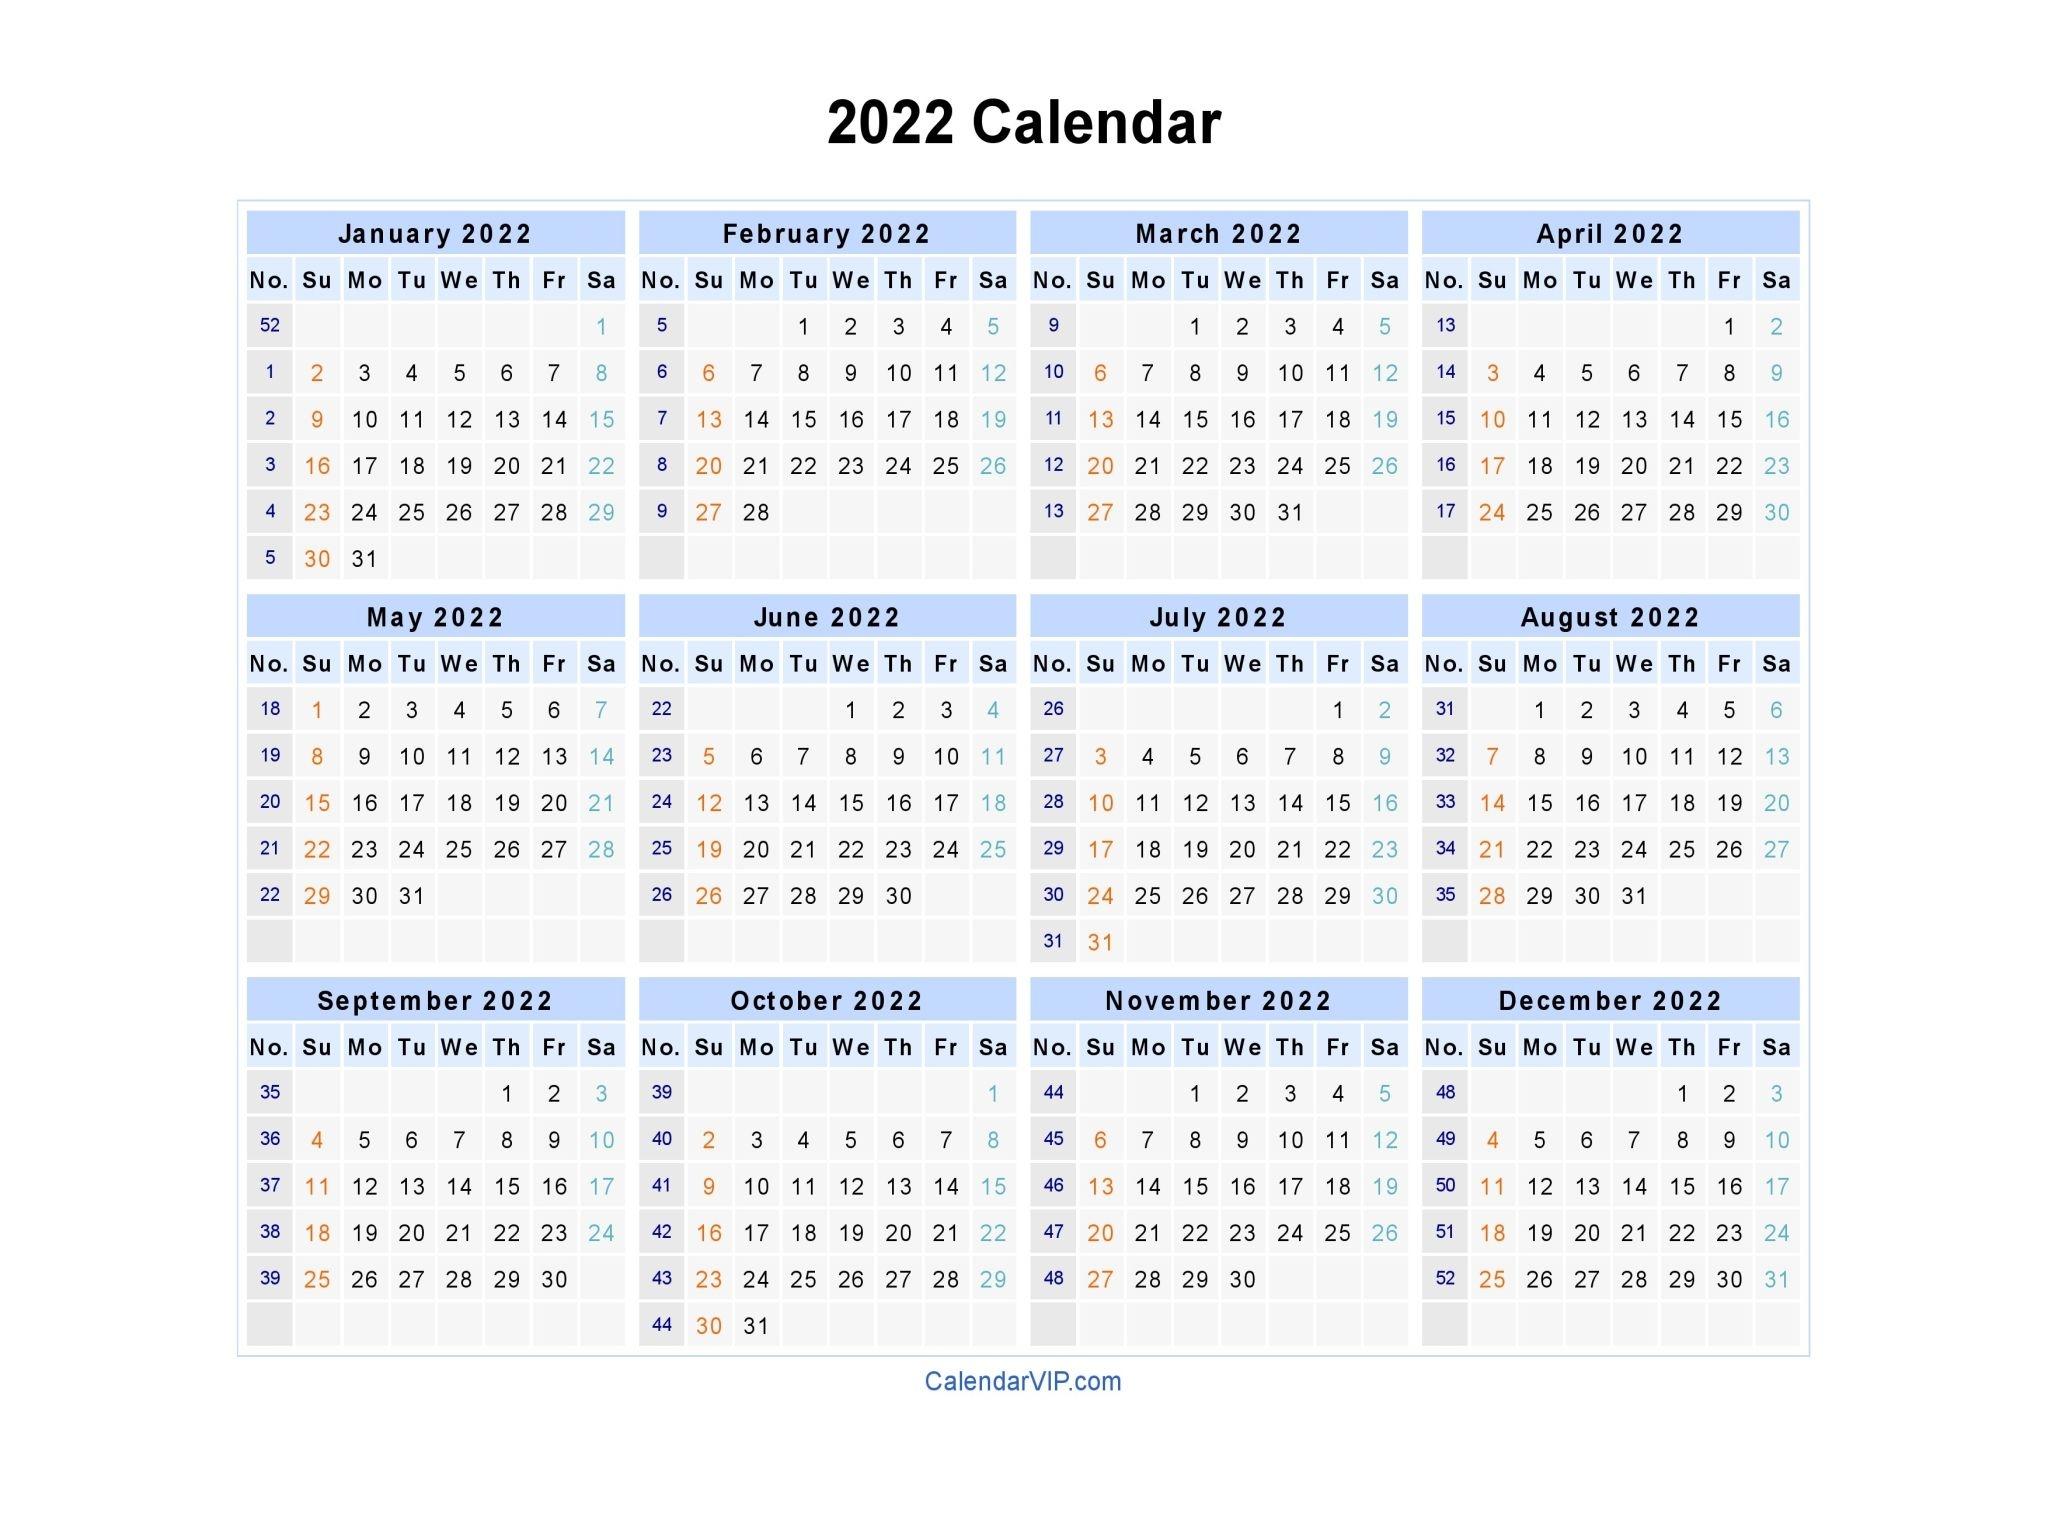 2022 Calendar - Blank Printable Calendar Template In Pdf